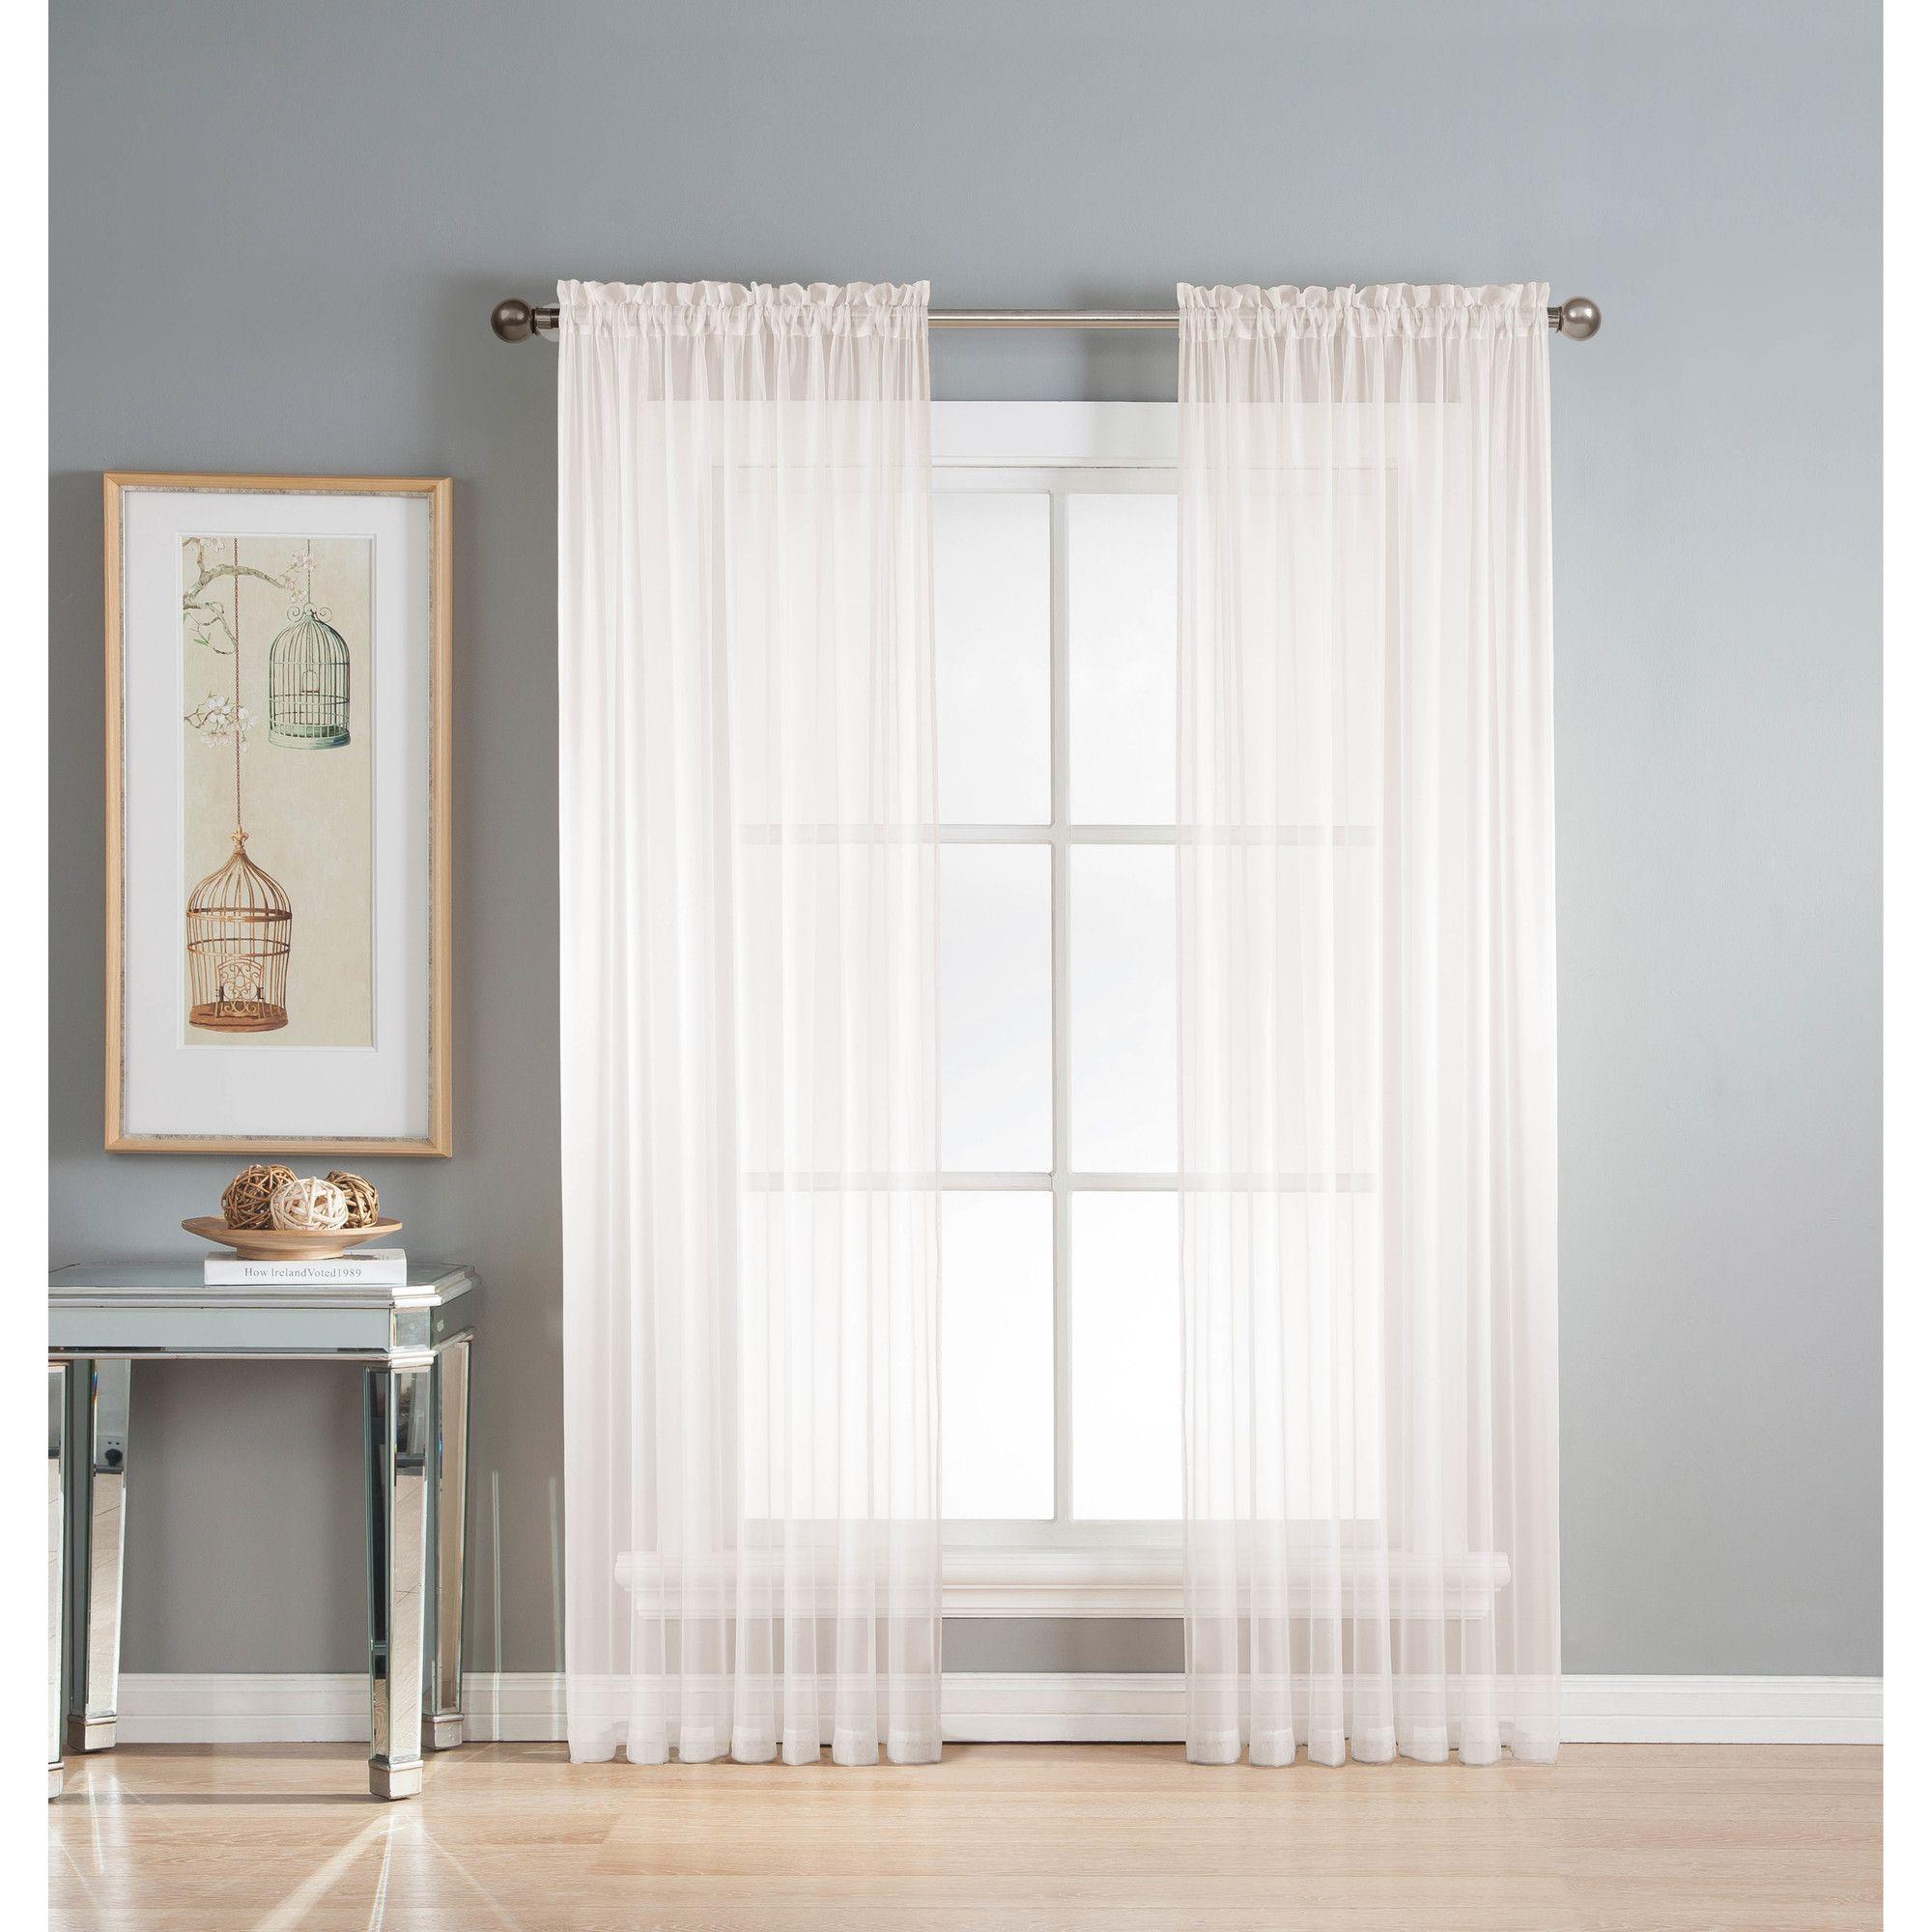 Plant City Geometric Semi Sheer Grommet Curtains Set Of 2